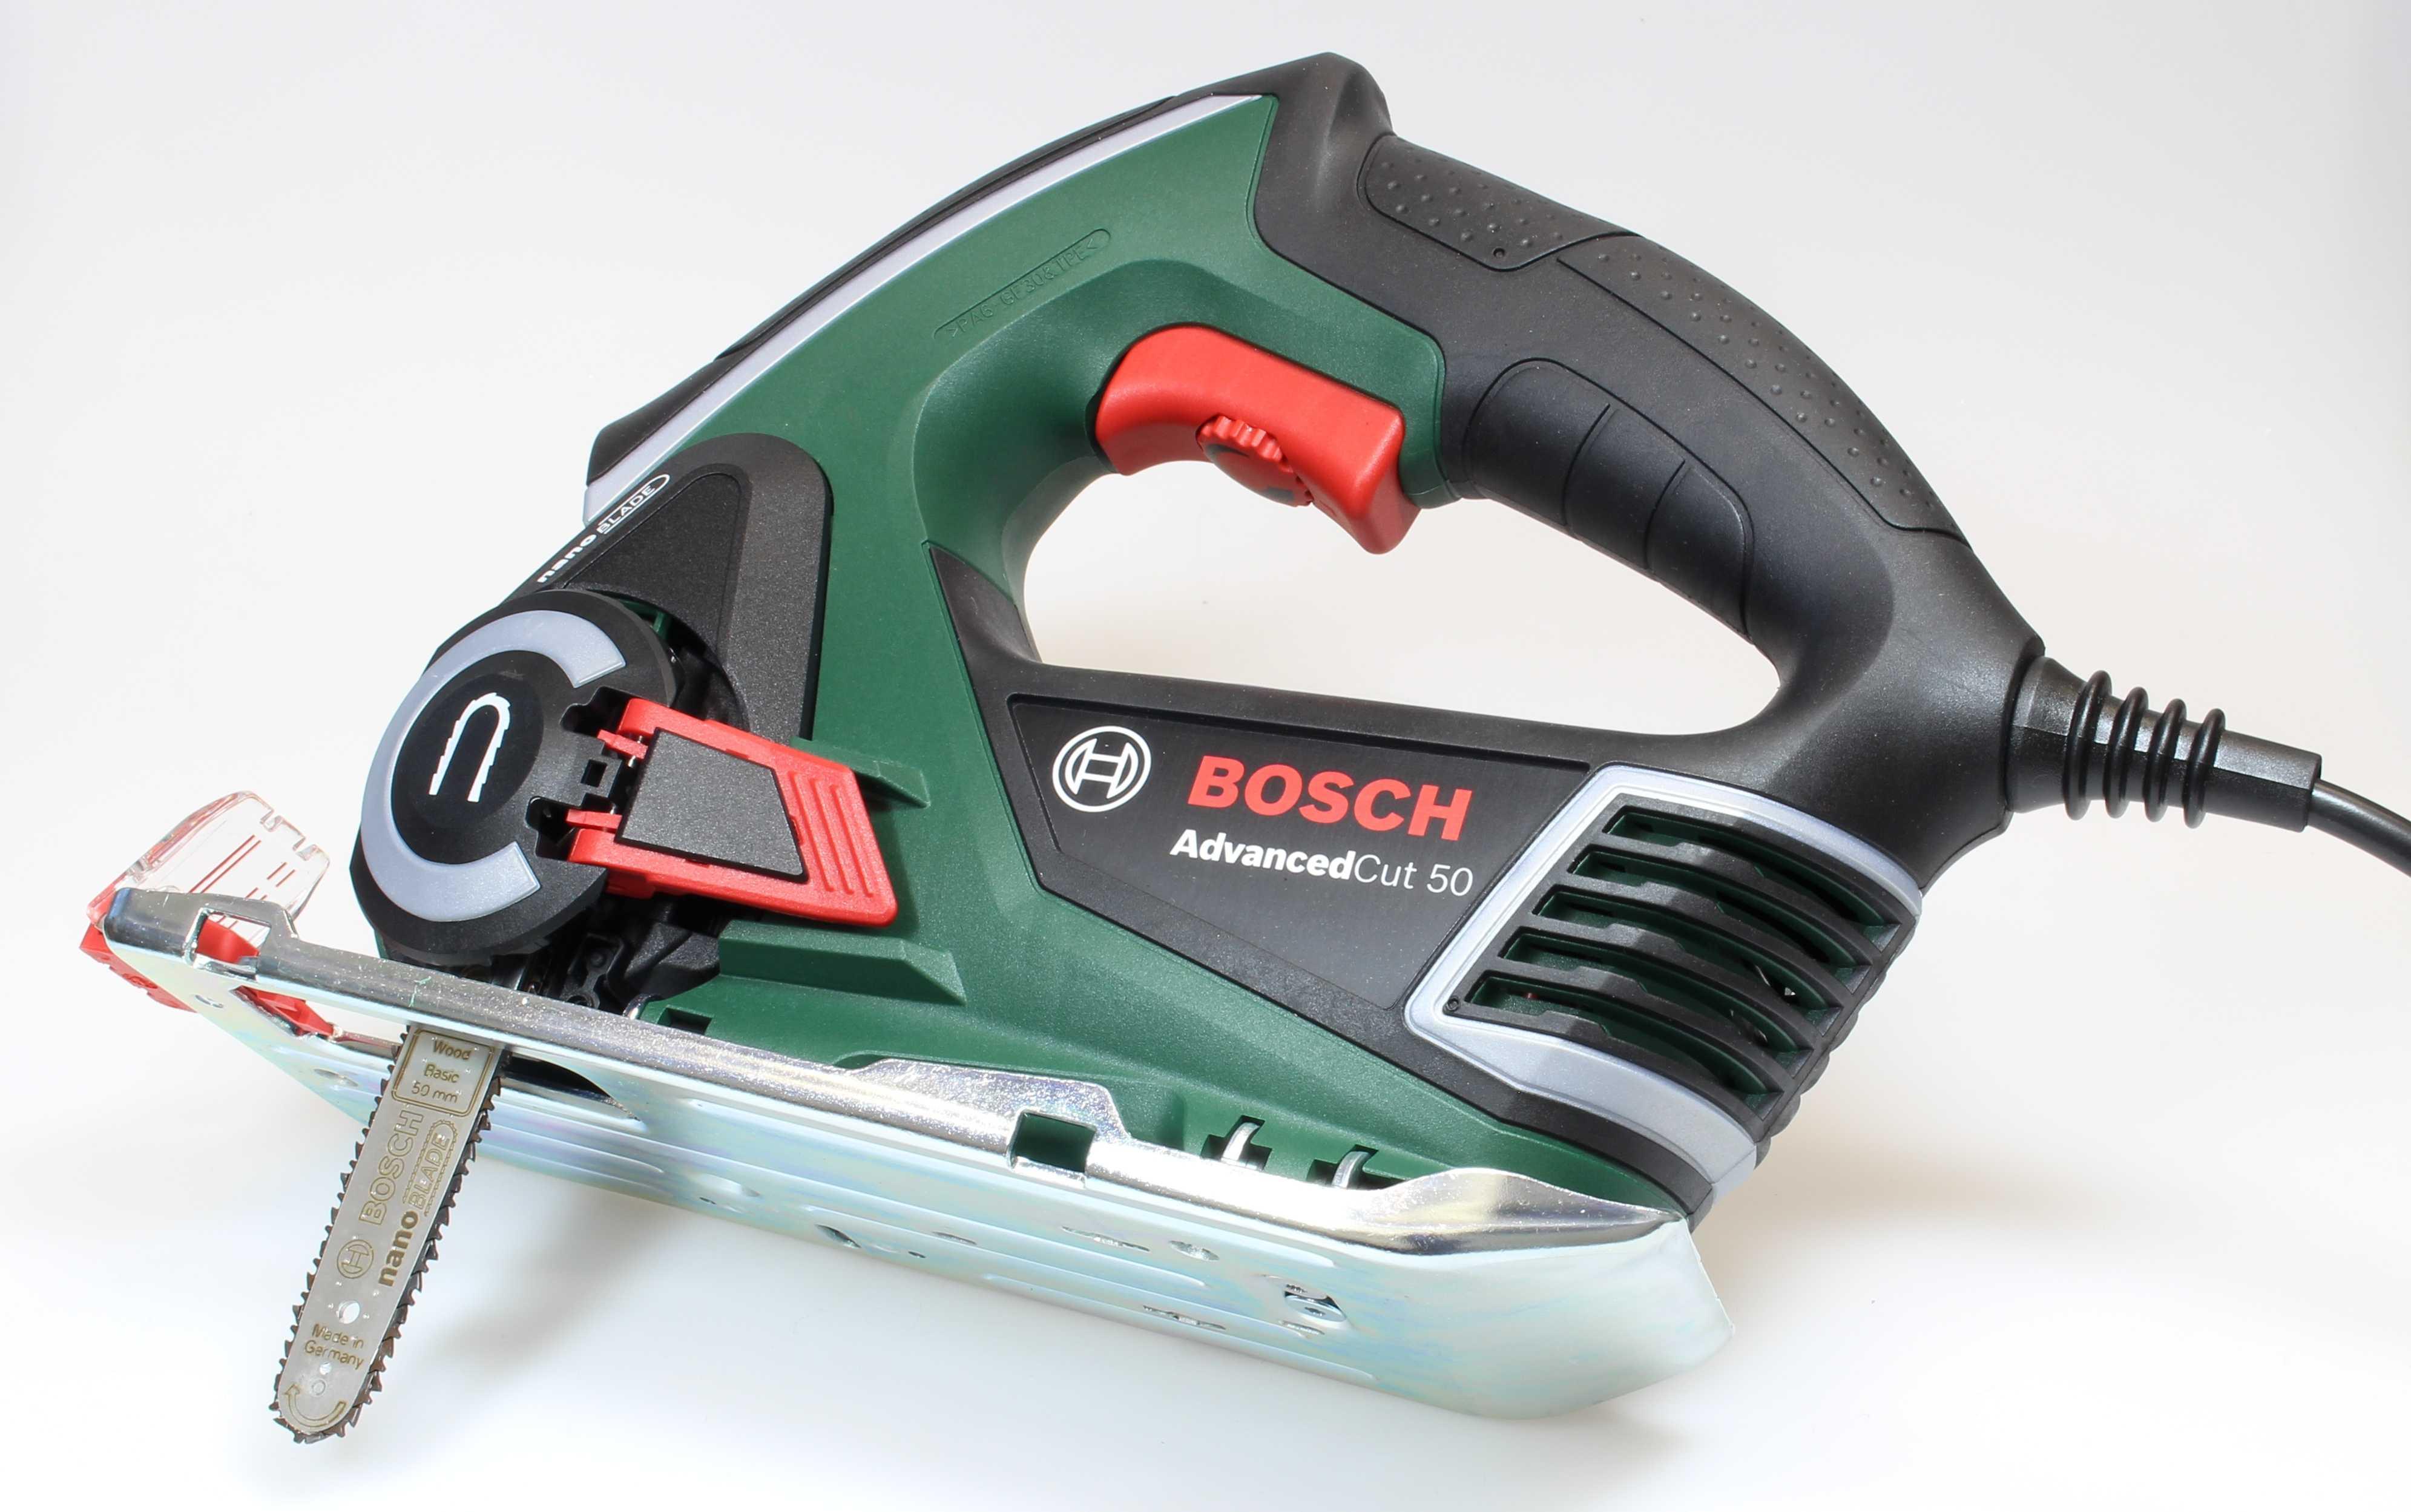 Video Bosch AdvancedCut 50